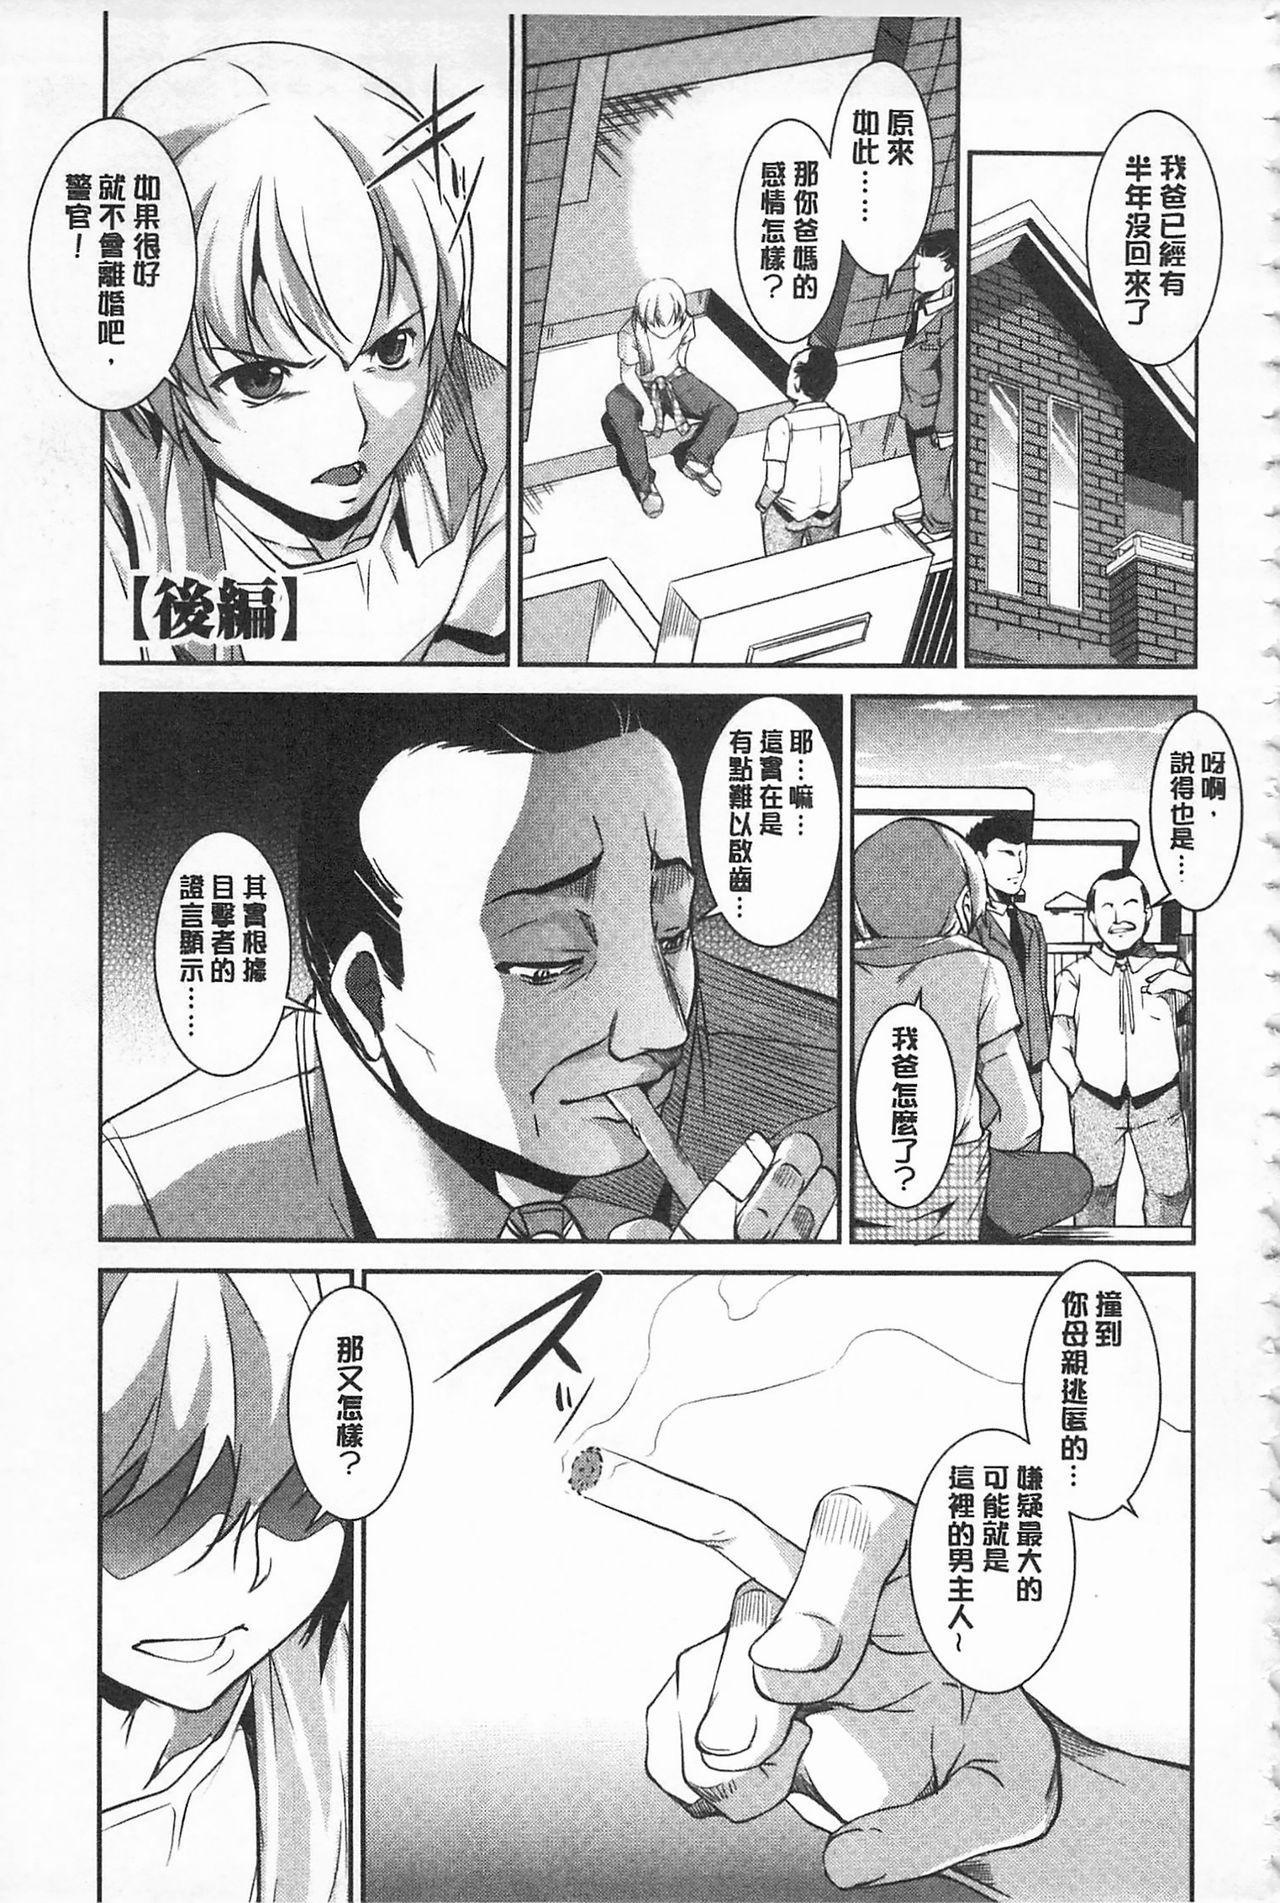 [Amano Kazumi] Seida Inyou -Seijo no Katachi Shita Intou- | 聖墮陰陽 -聖女的容貌與淫蕩- [Chinese] 180